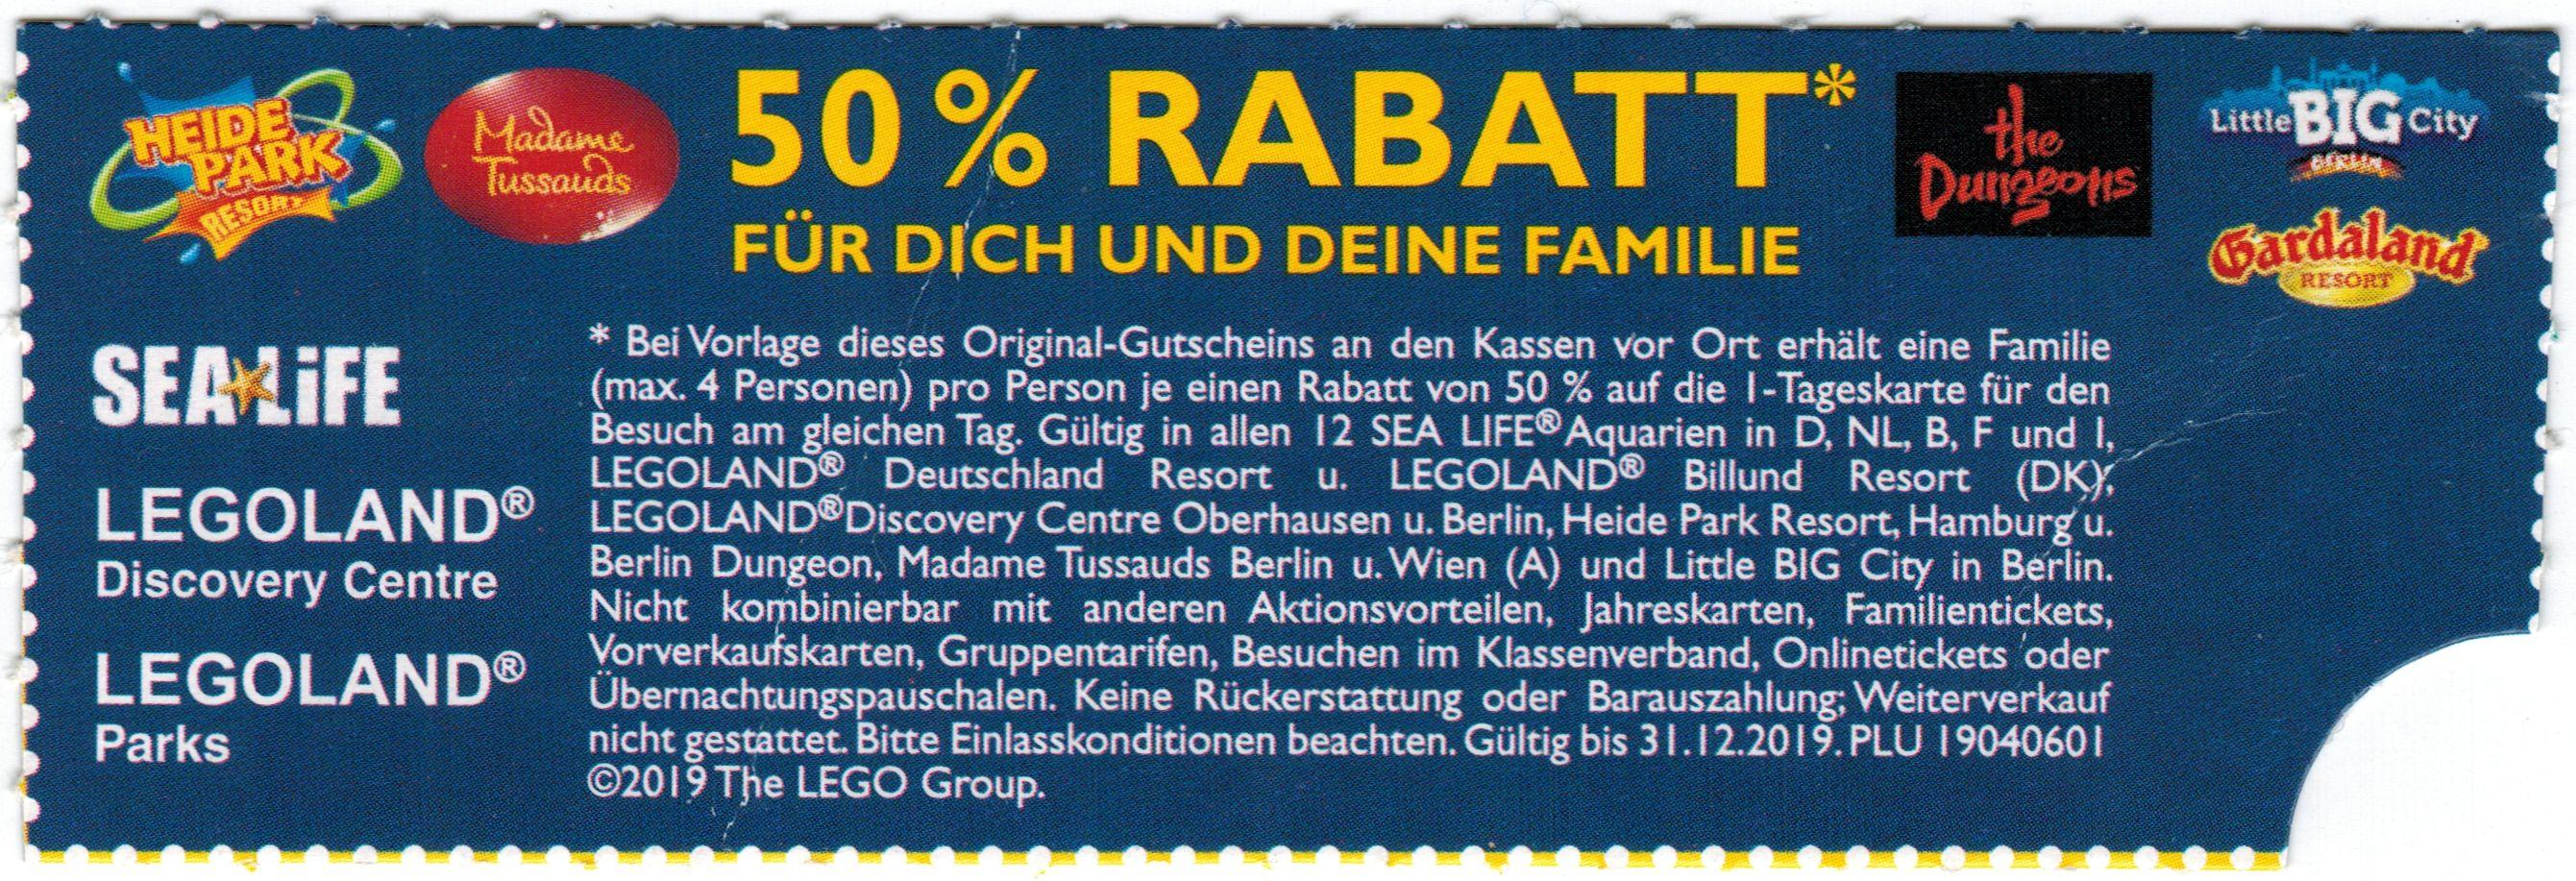 Happy Meal 50 Rabatt Für Legoland Sea Life Heide Park